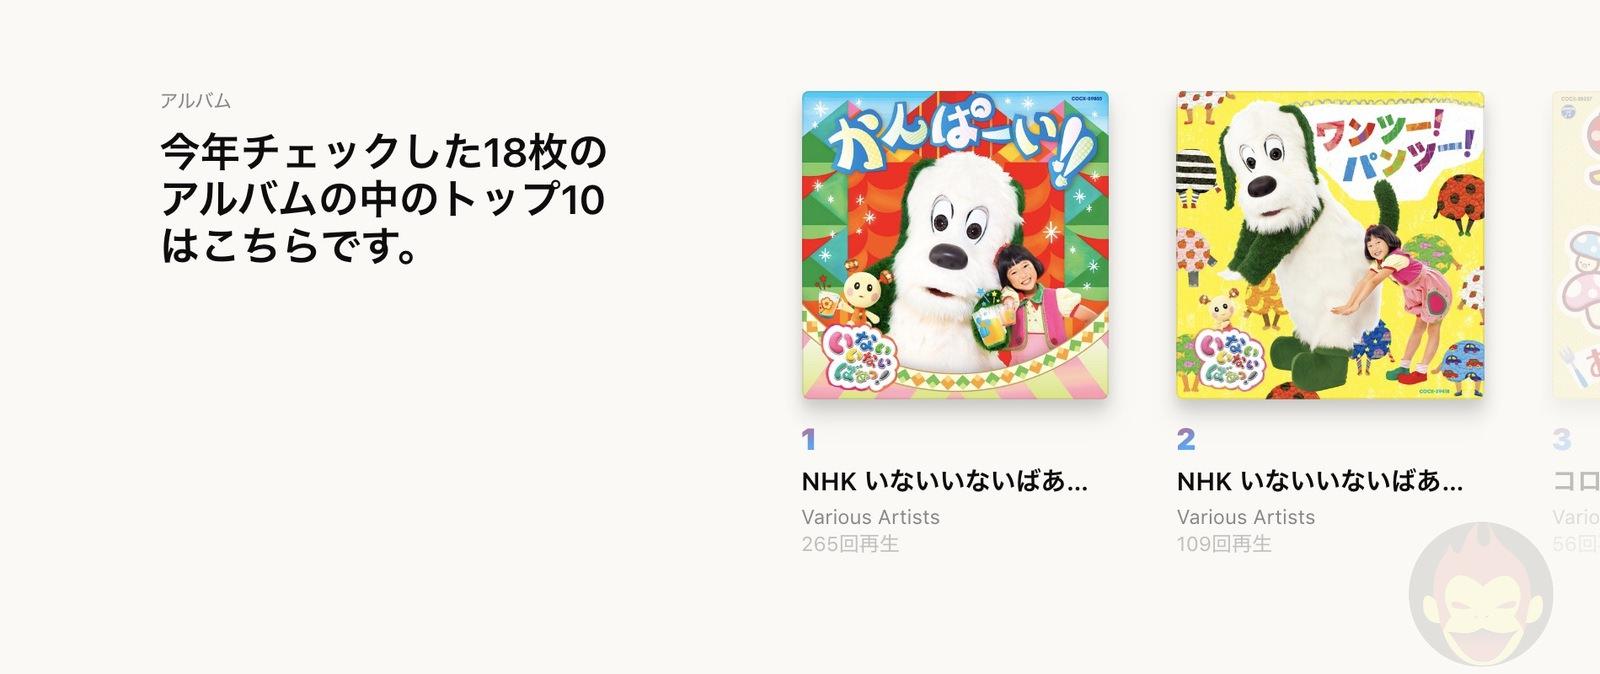 Apple Music Replay Gori Version 05